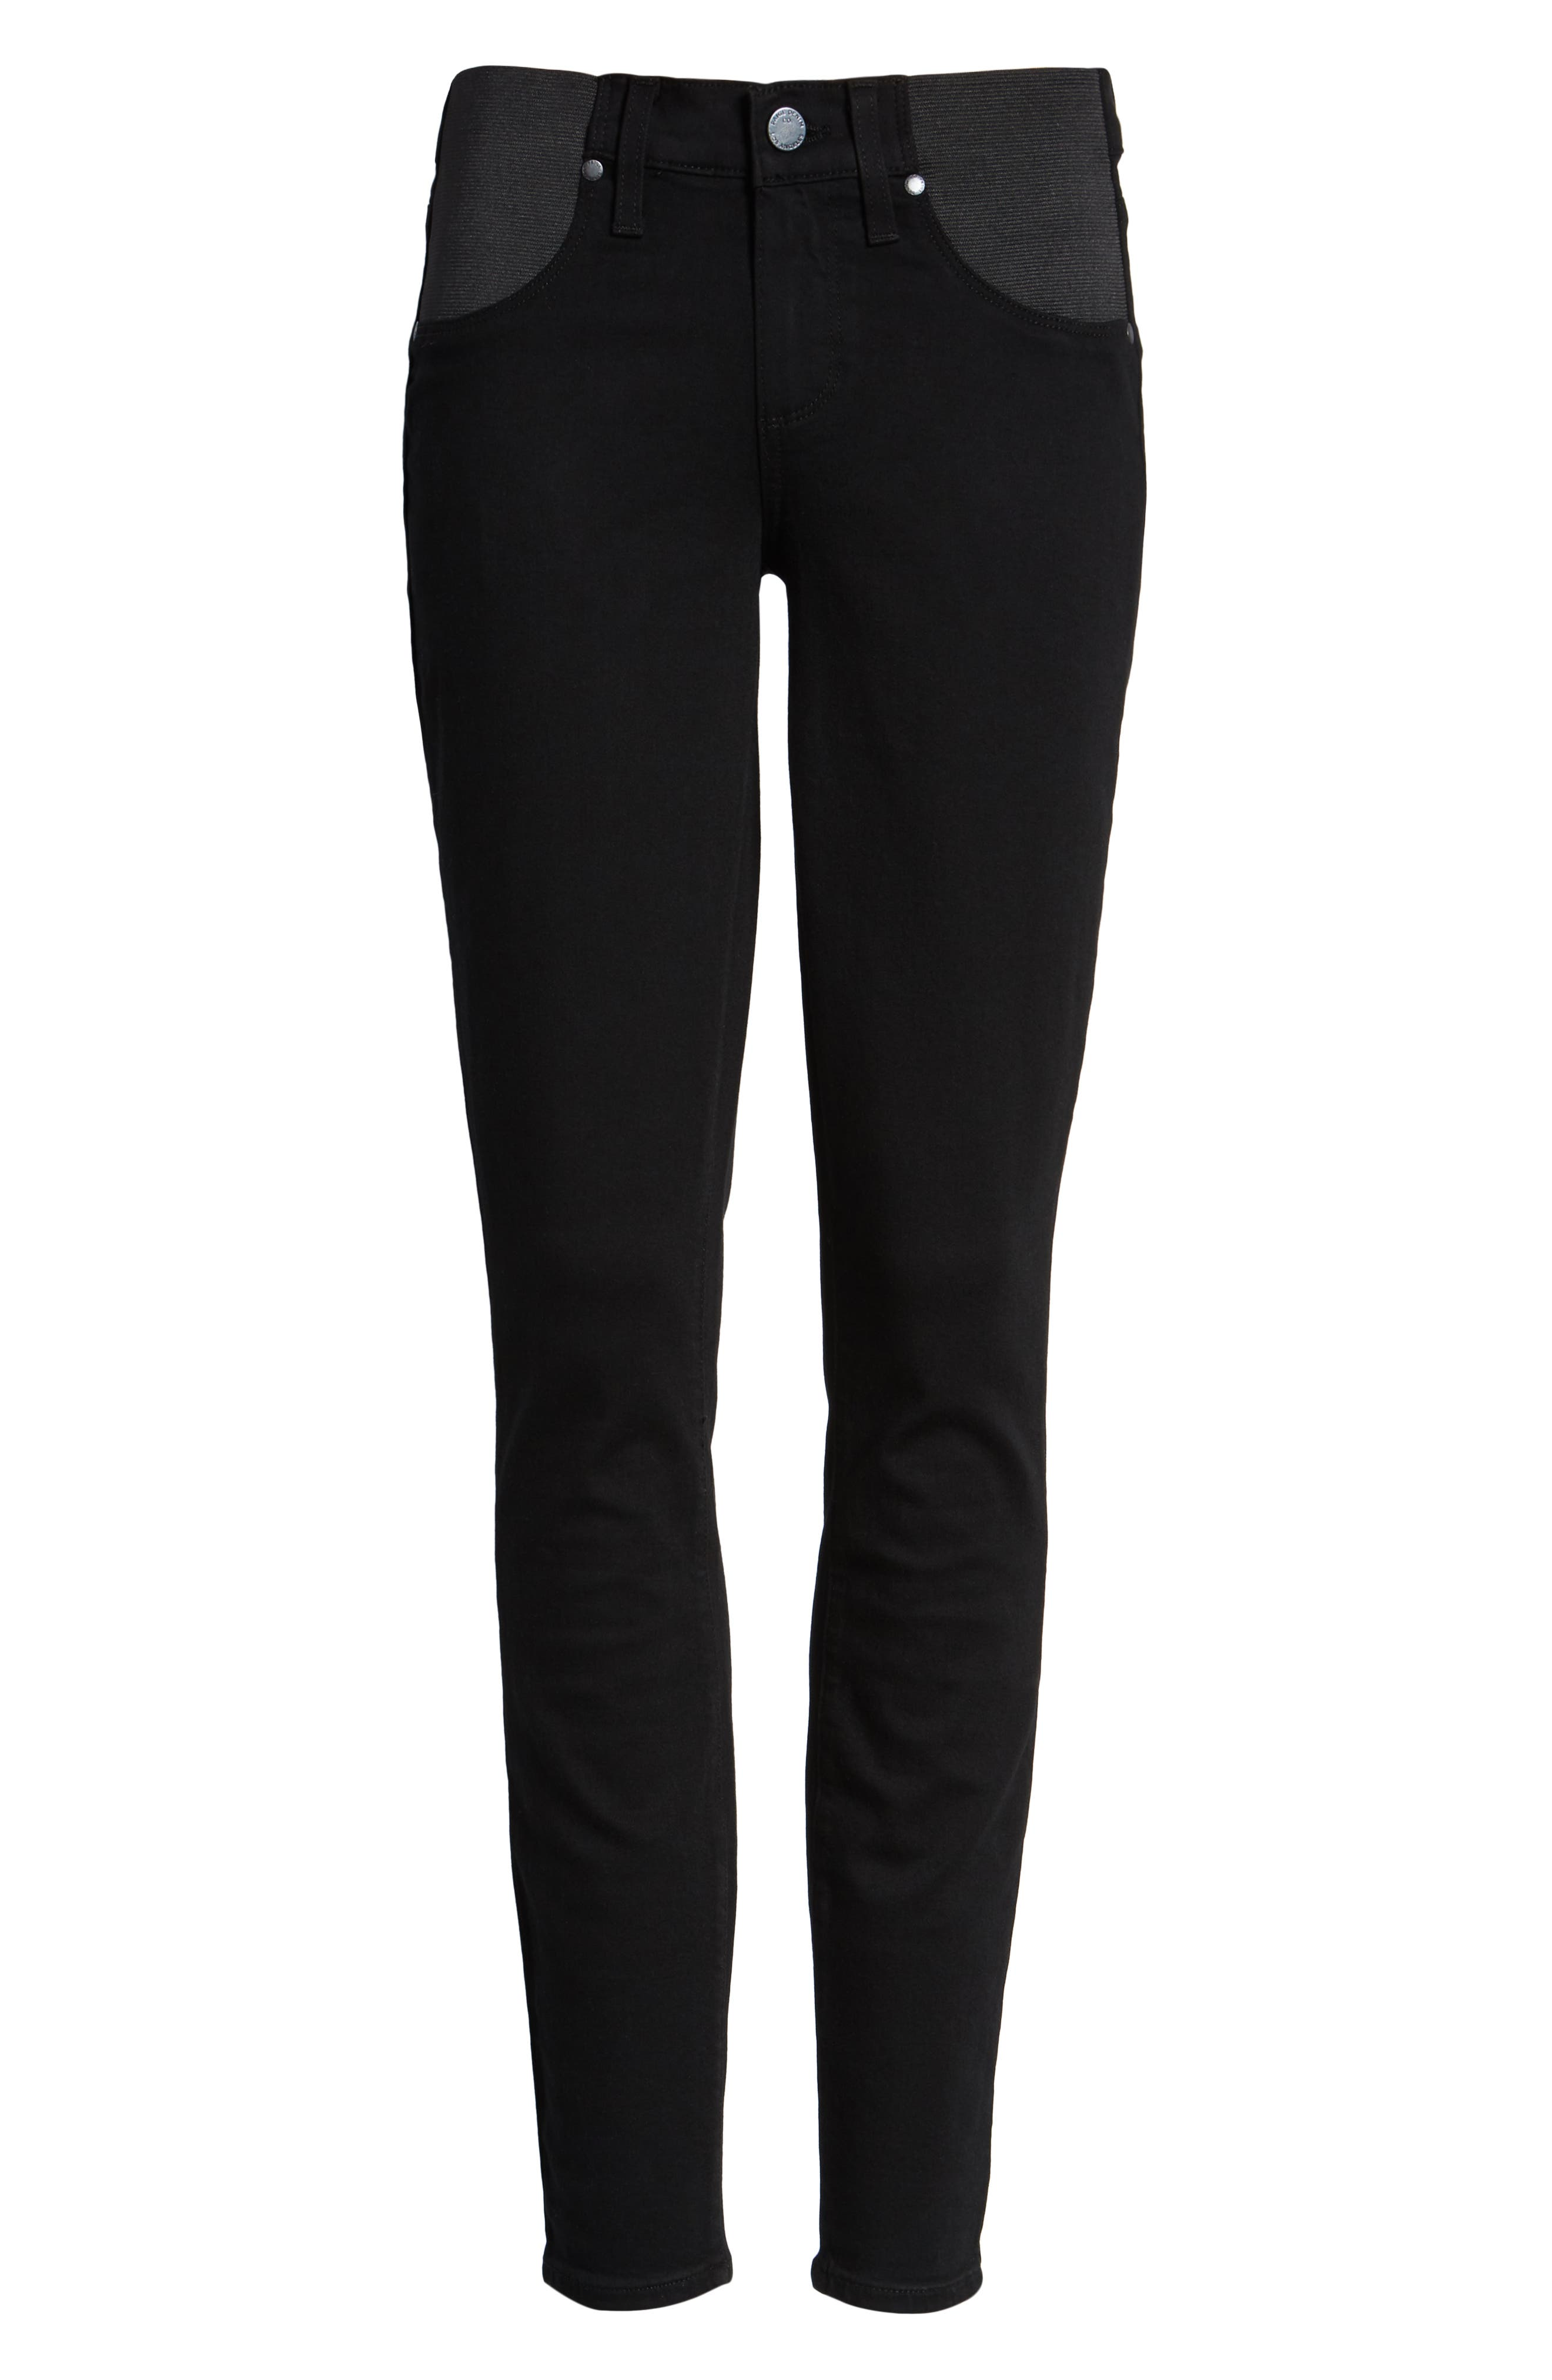 'Transcend - Verdugo Ultra Skinny Maternity Jeans,                             Alternate thumbnail 6, color,                             BLACK SHADOW